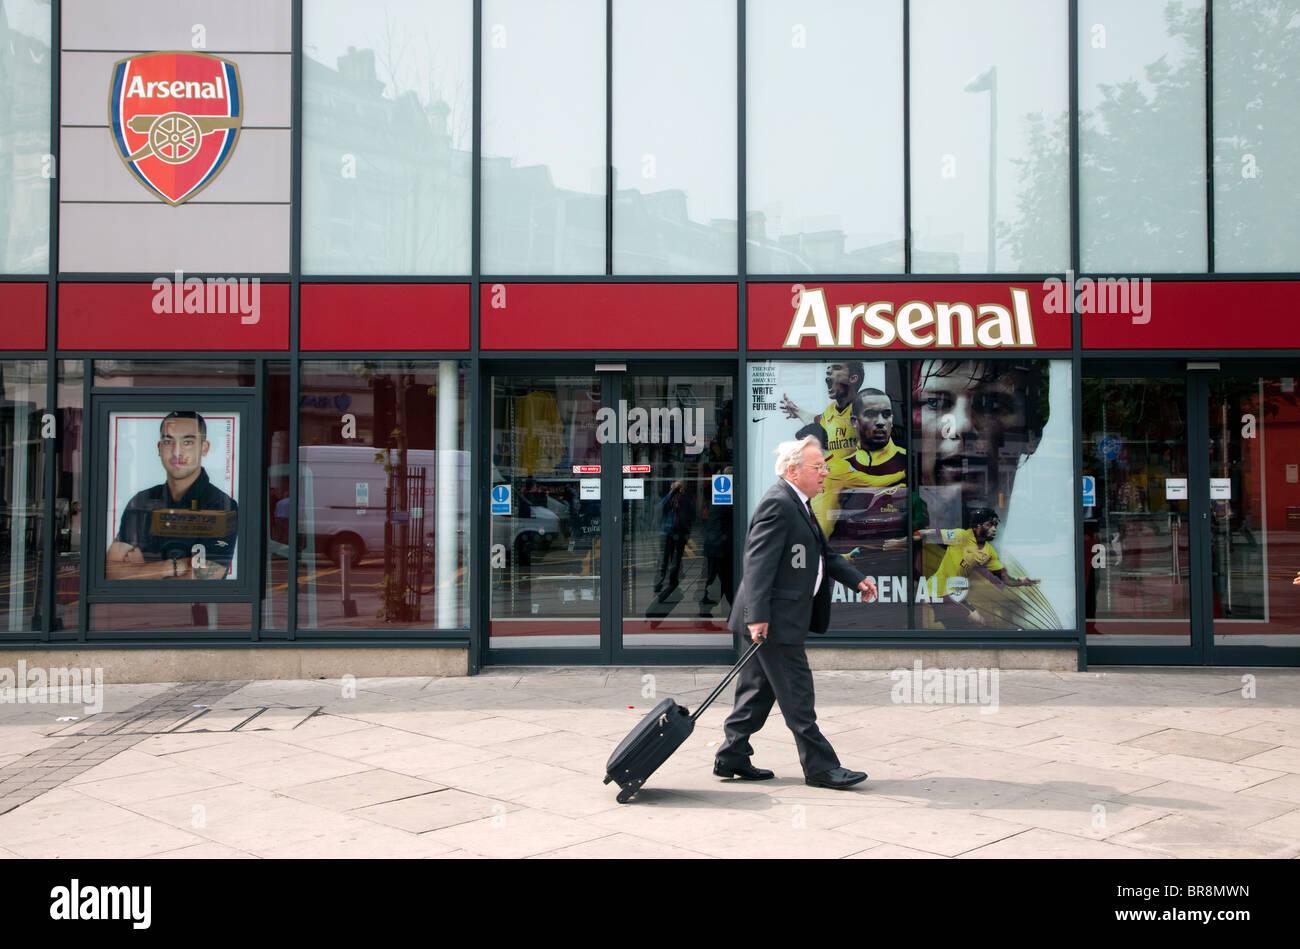 5f76eaeb77e Arsenal FC shop in Finsbury Park, North London Stock Photo: 31539473 ...